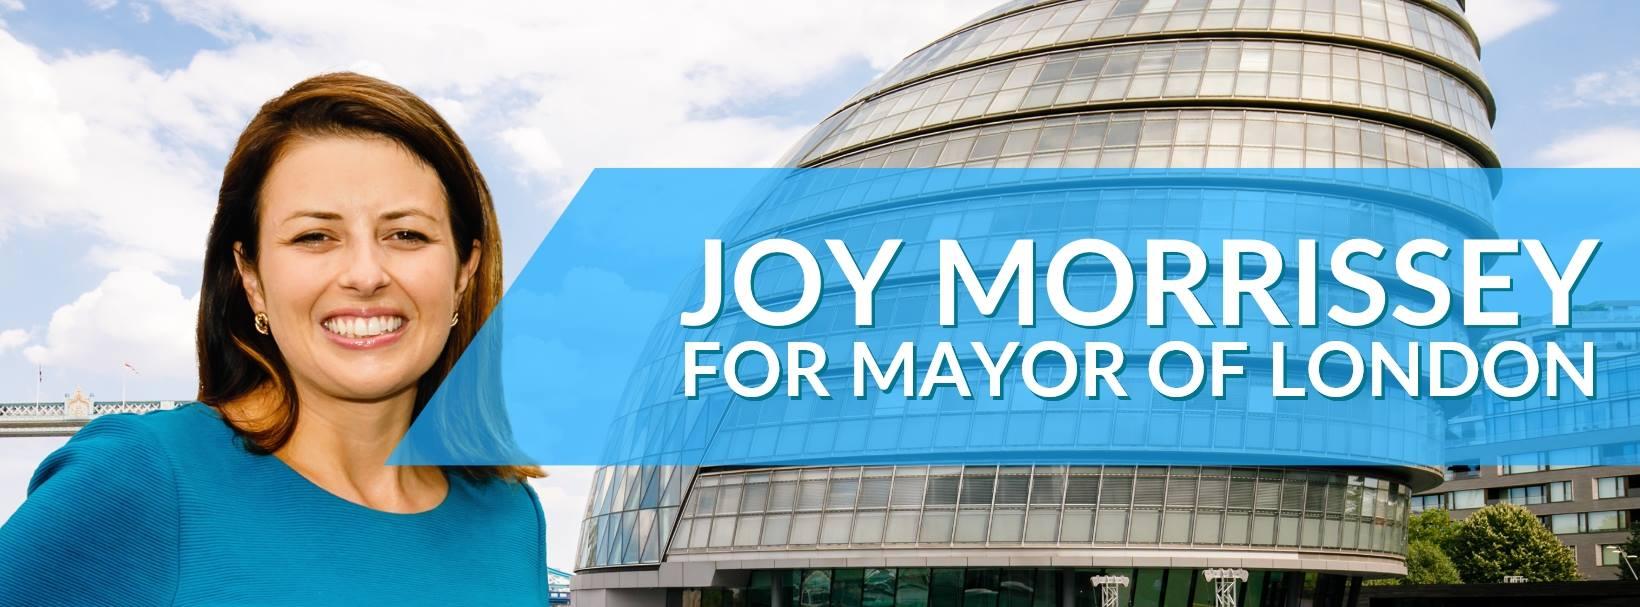 Joy Morrissey